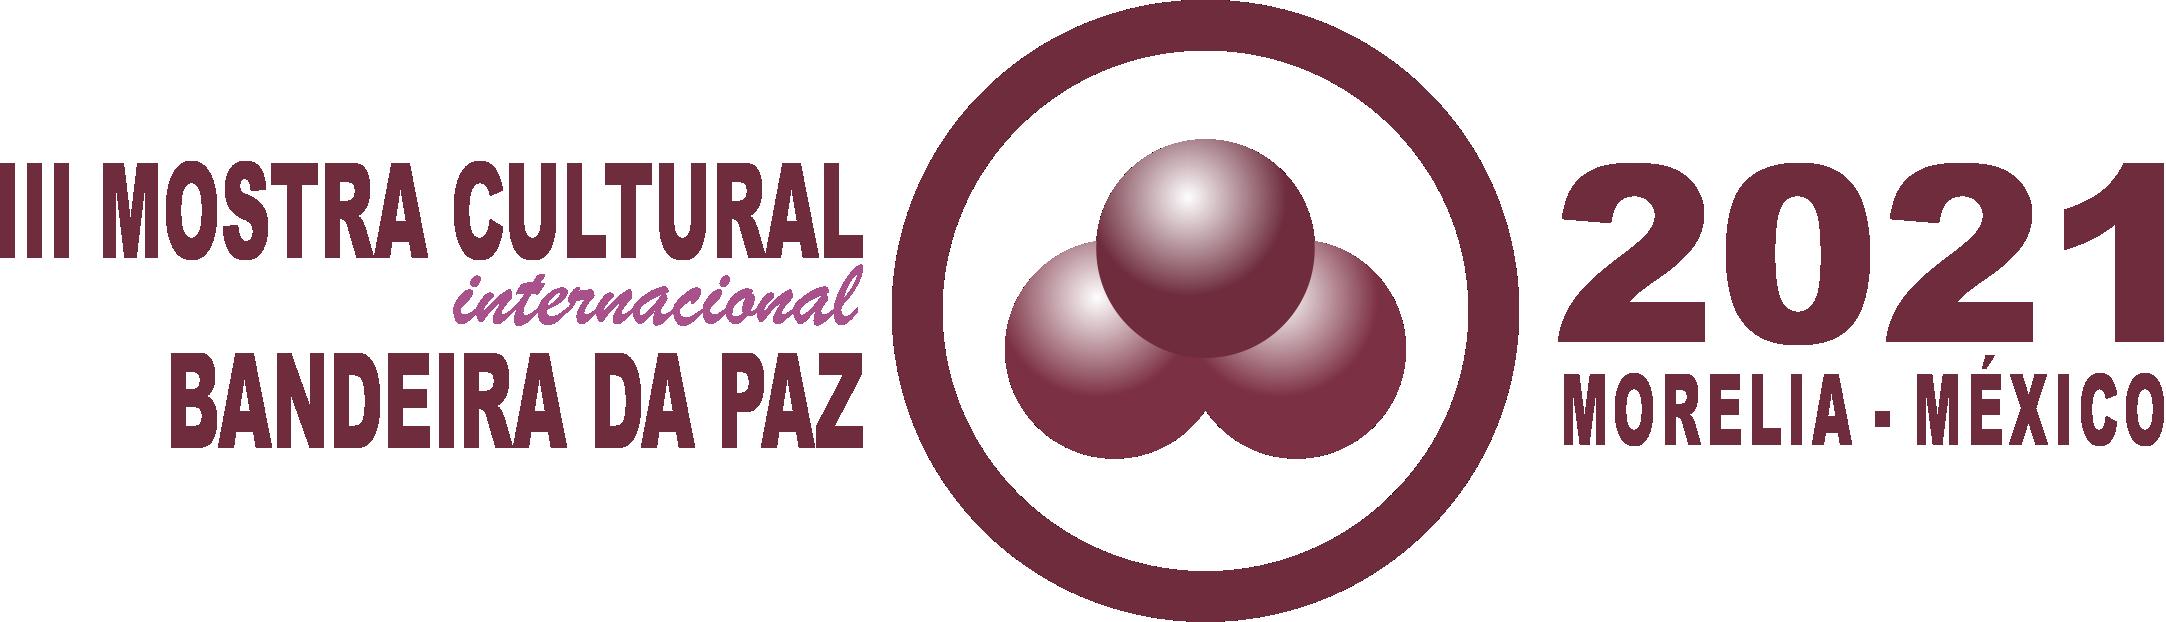 Logo MOSTRA CULTURAL 2021_MORELIA MEXICO